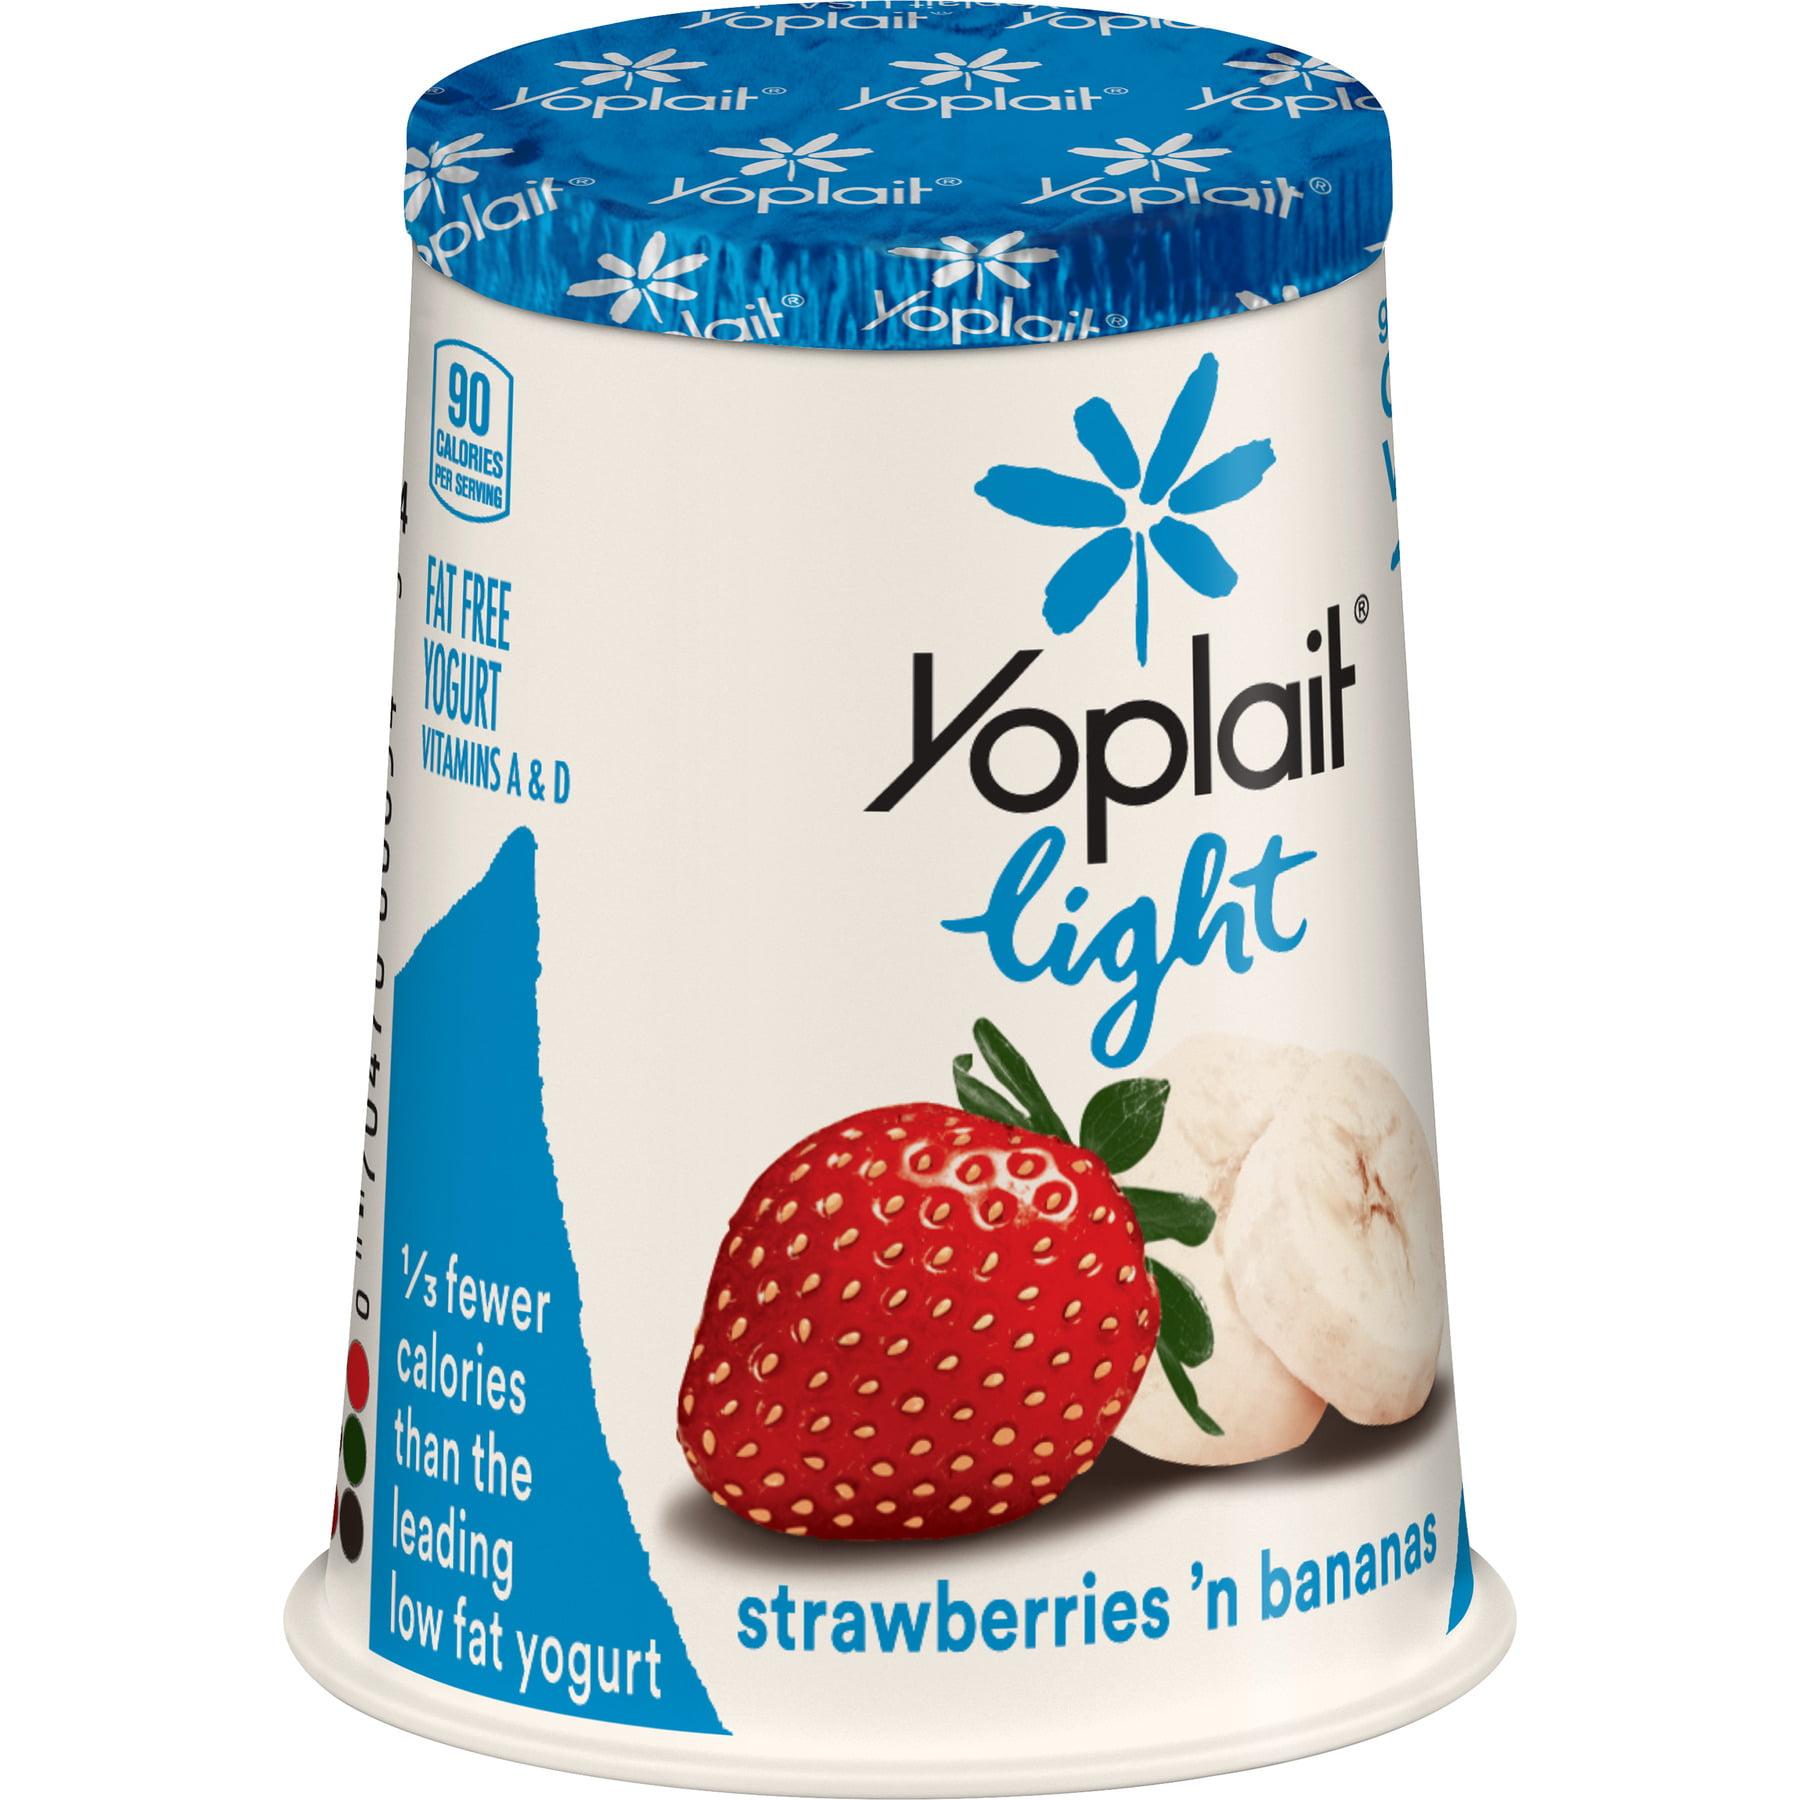 Yoplait Light Fat Free Yogurt